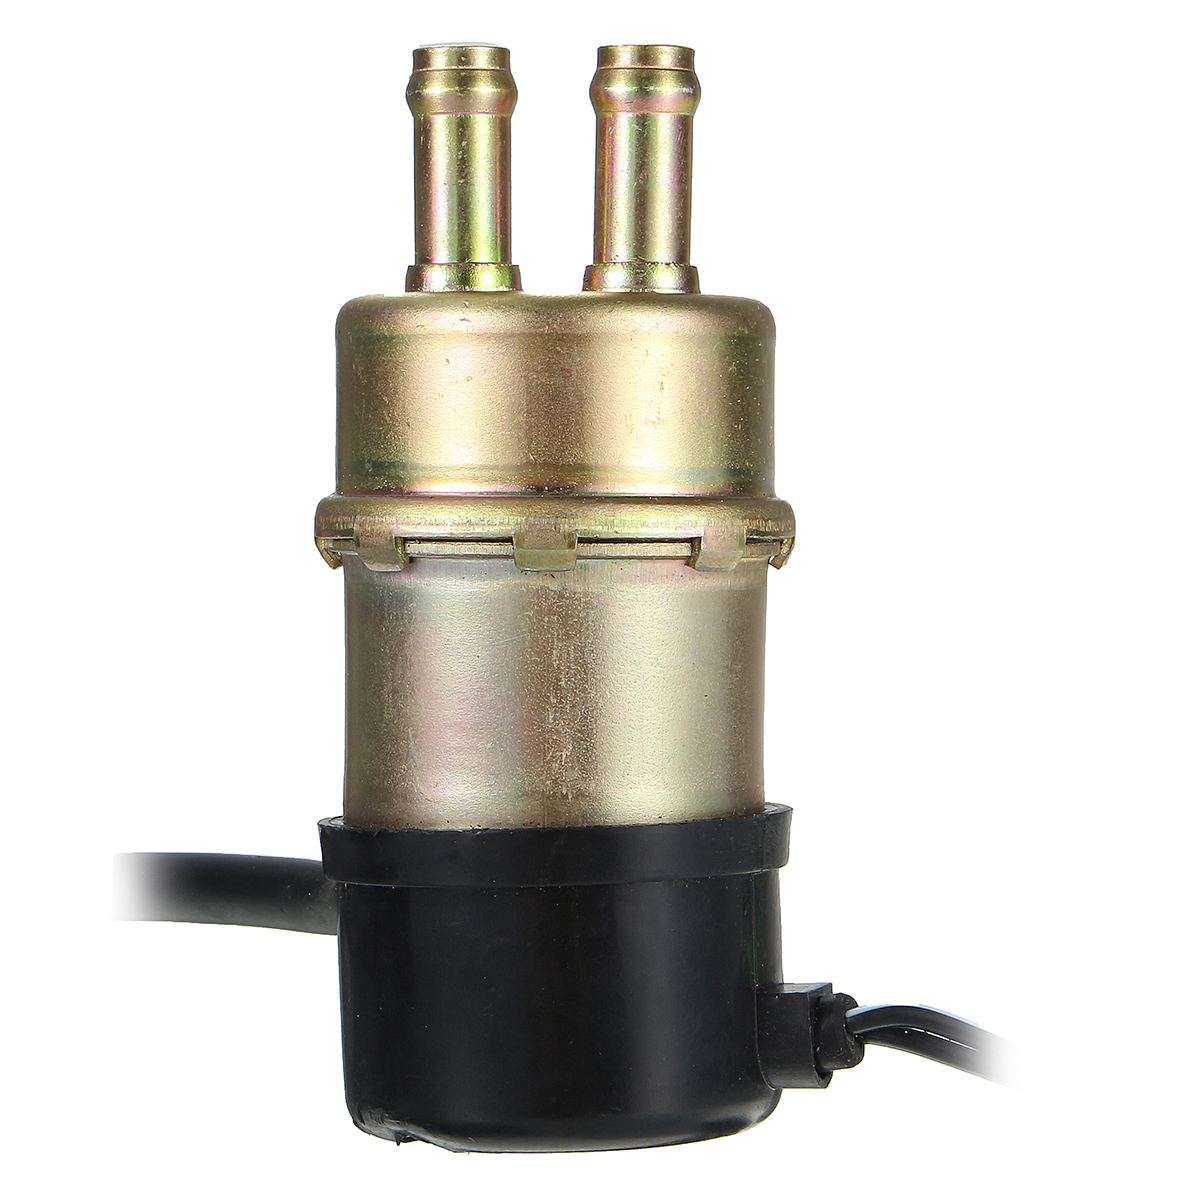 Ad6b2a Kawasaki 3010 Fuel Filter